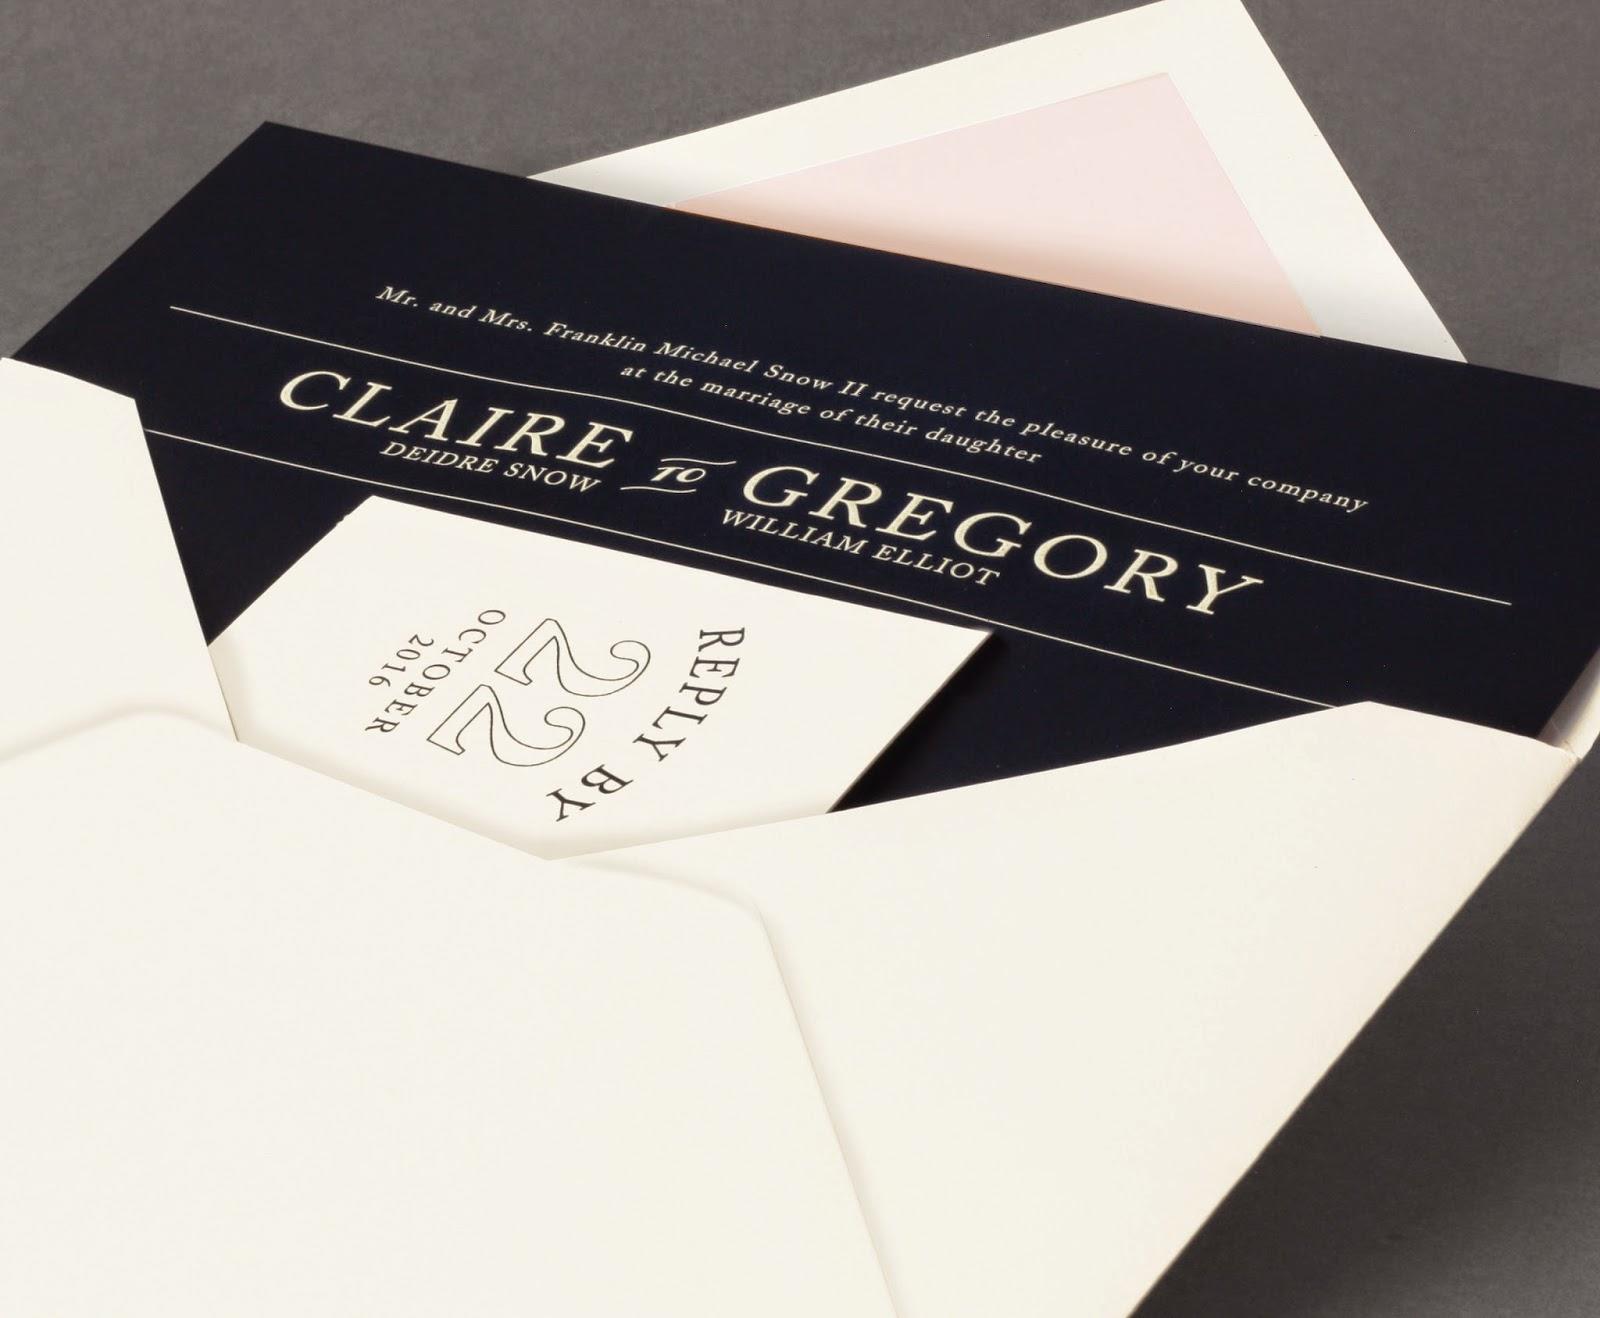 William Arthur Blog: Our New Vera Wang Wedding Album: Black